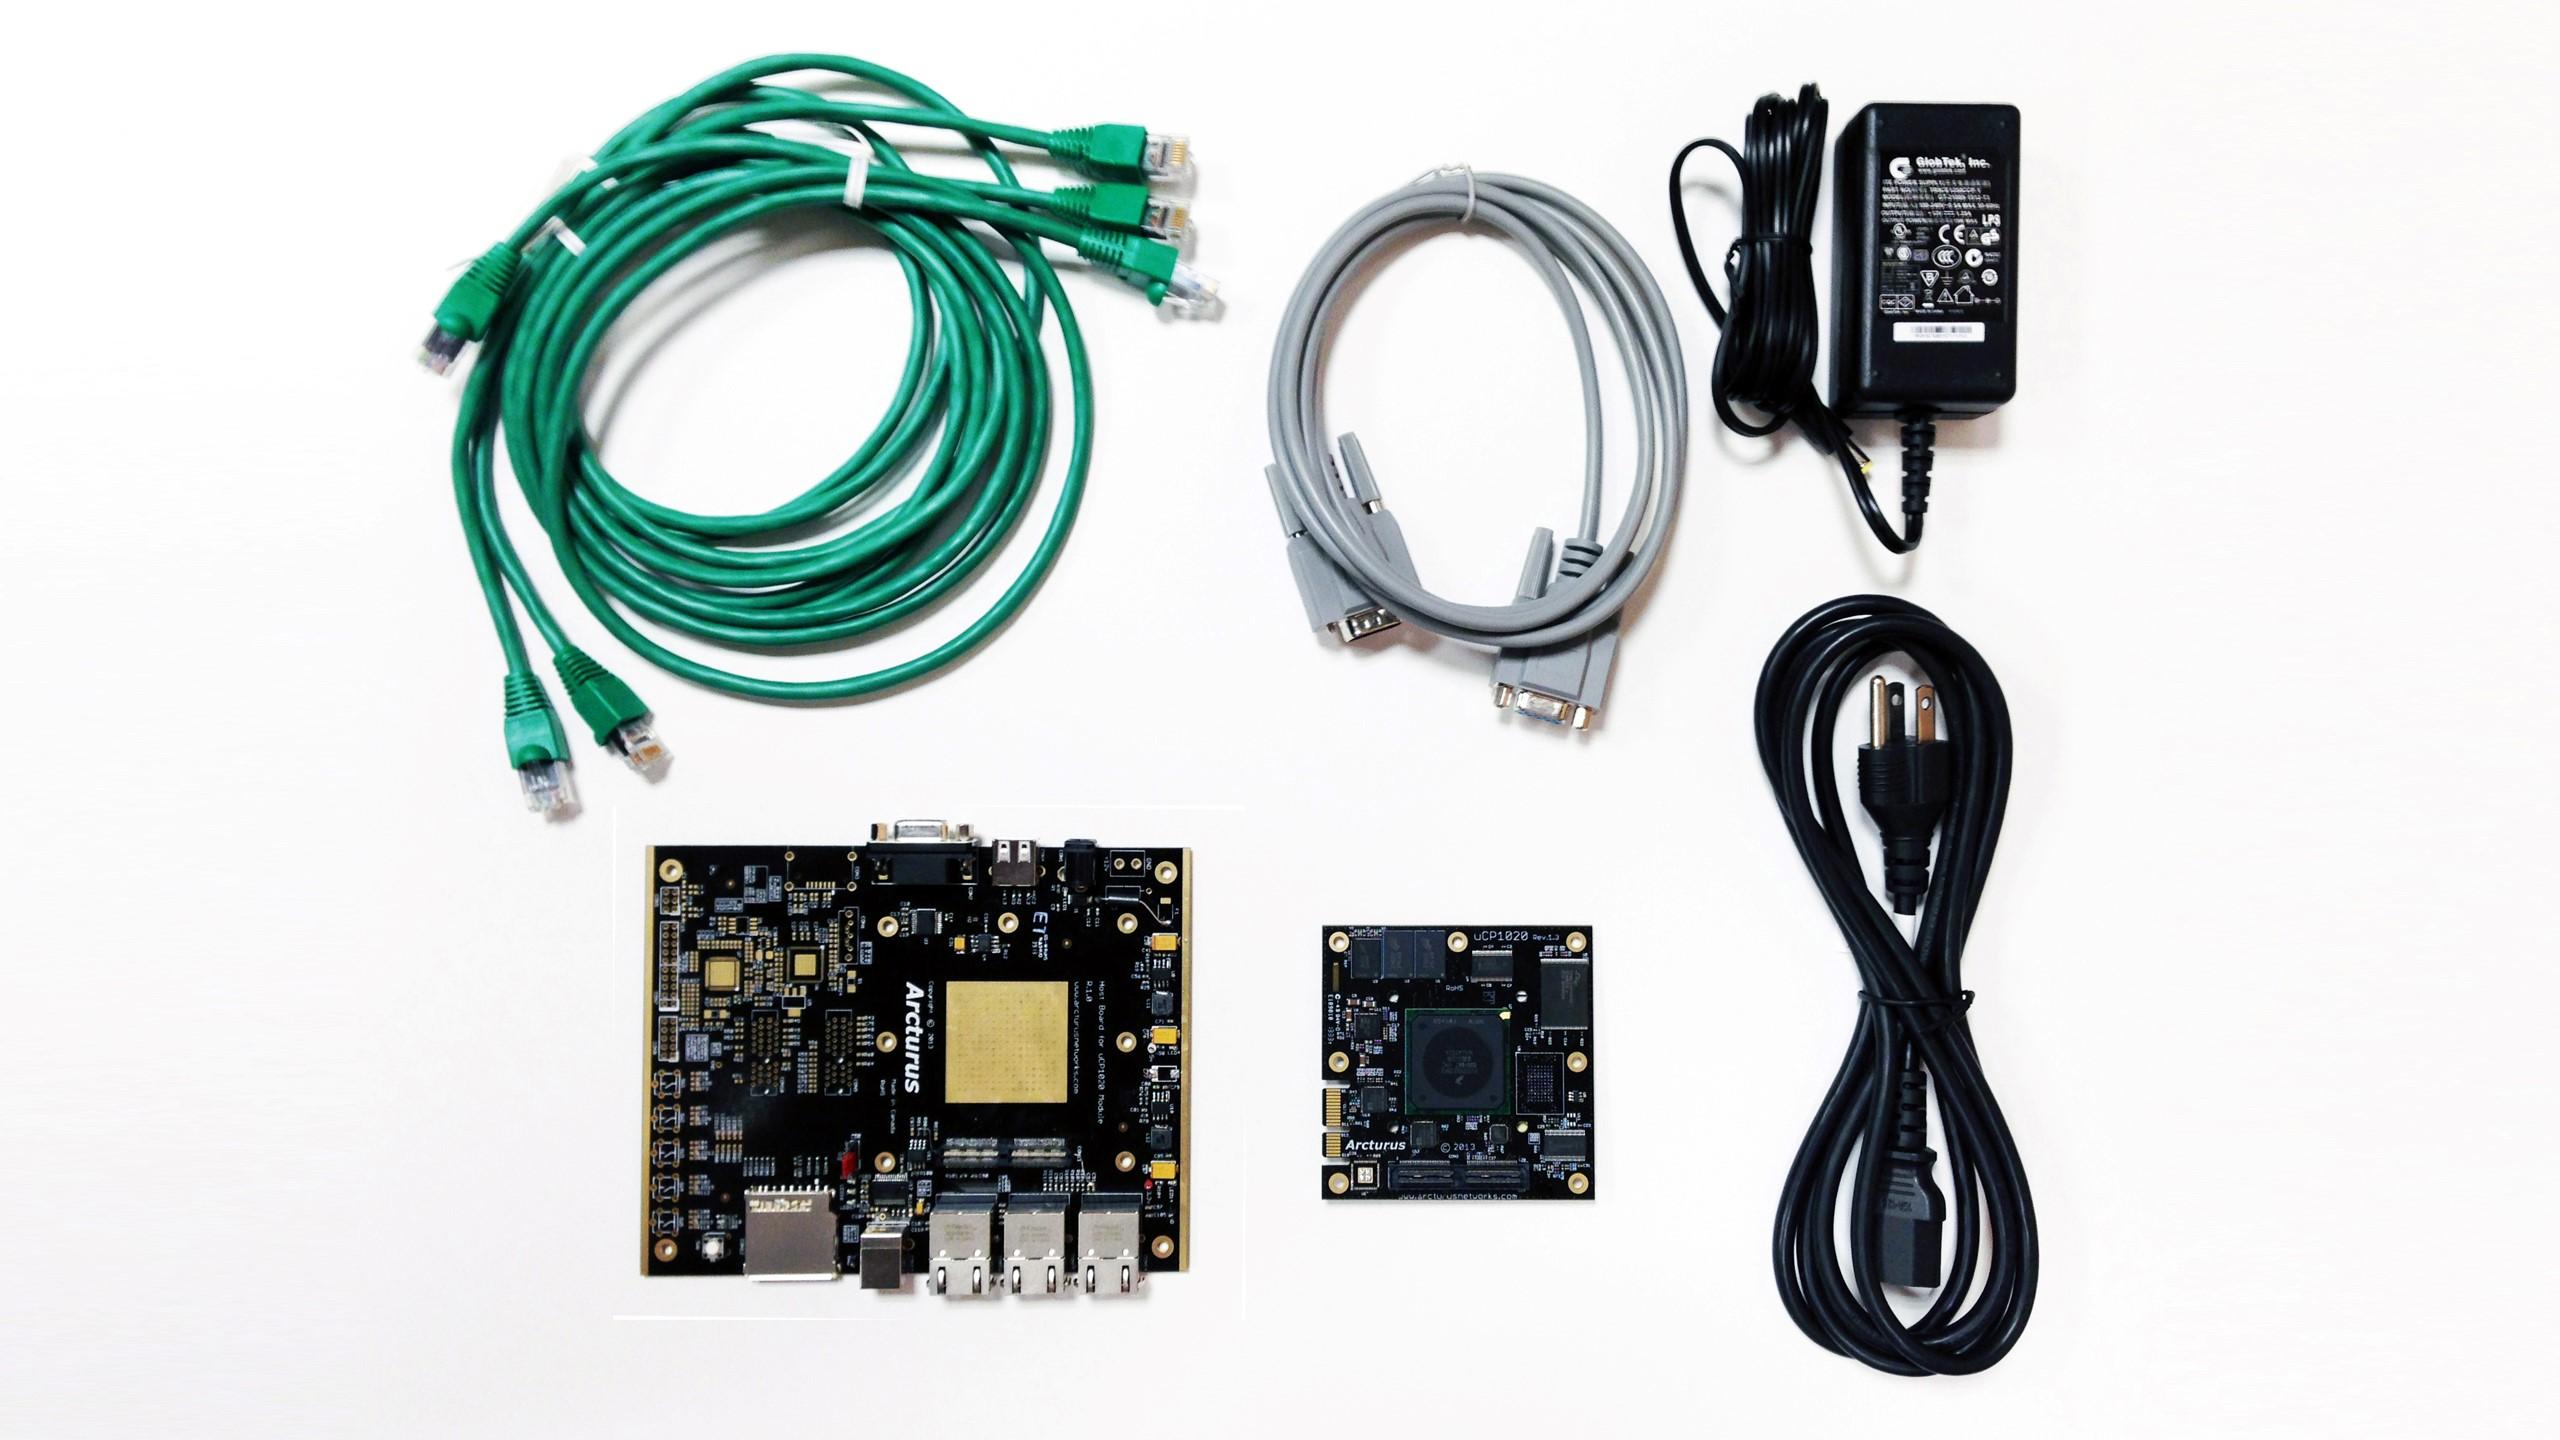 uCP1020 Development Kit